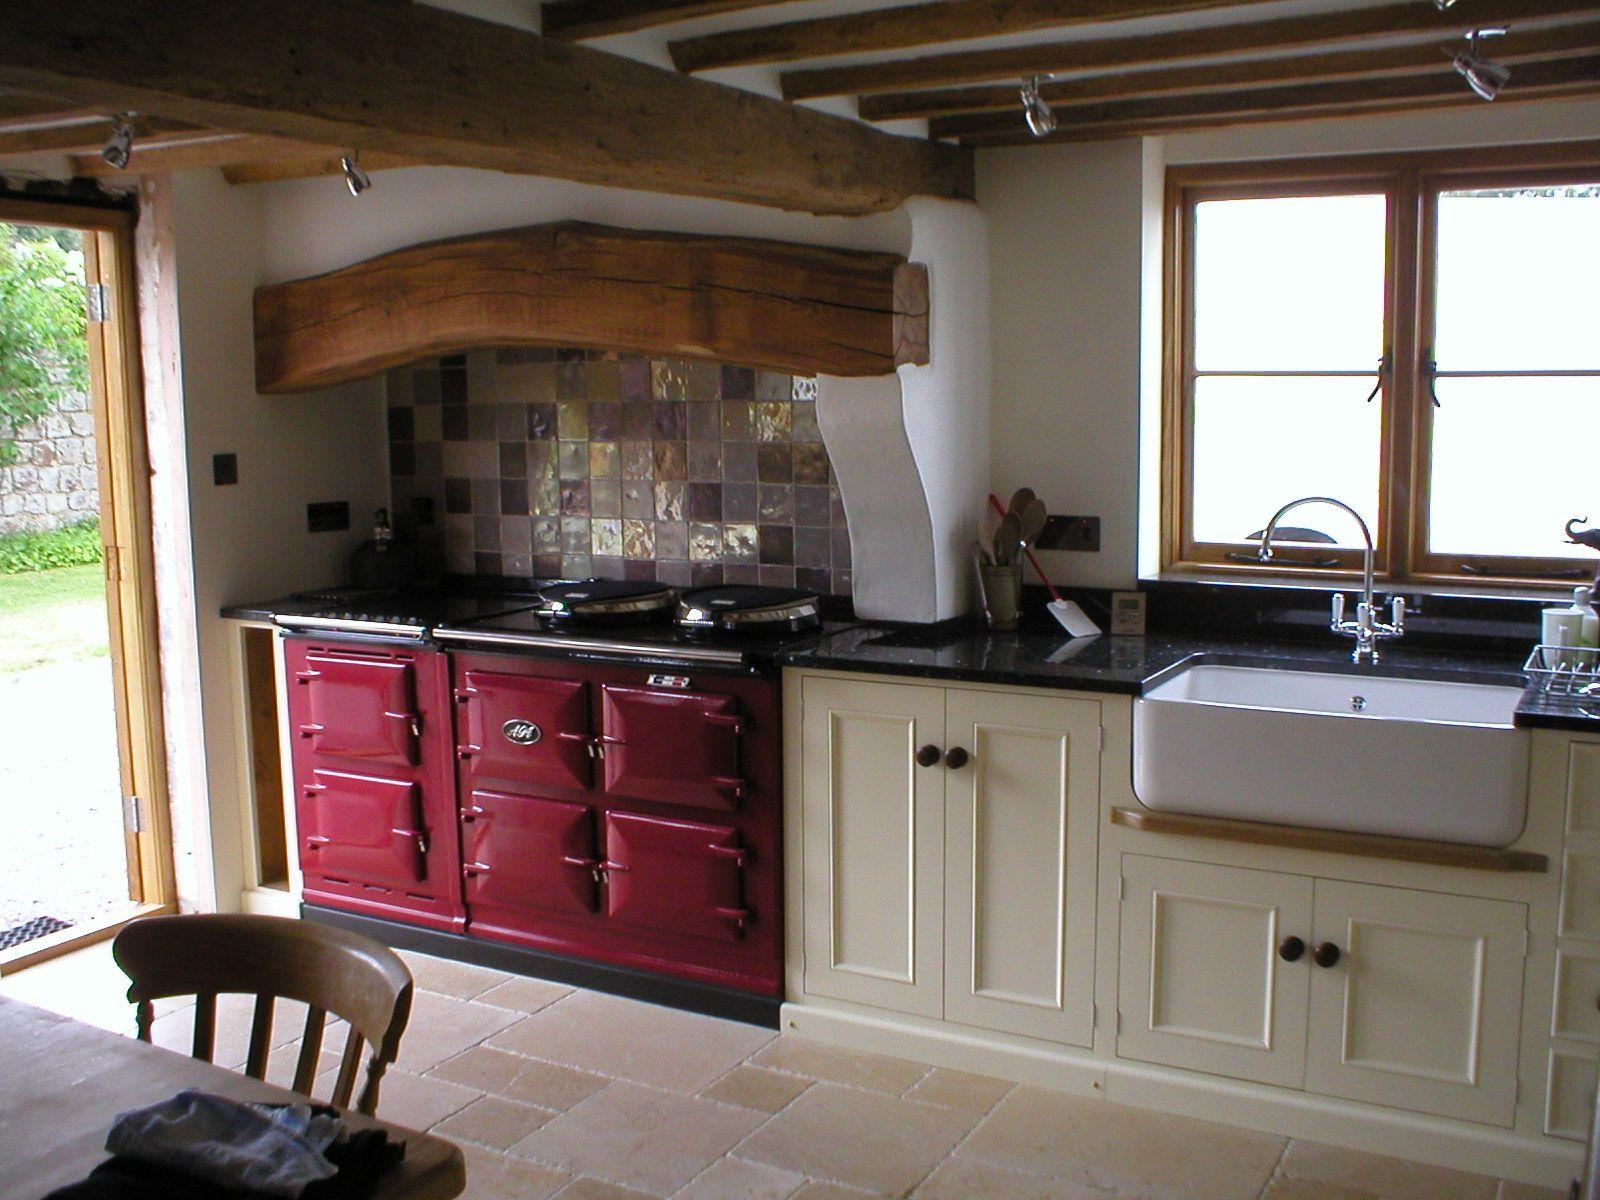 Кухня в стиле кантри с печью AGA | kitchen | Pinterest | Küchenherde ...